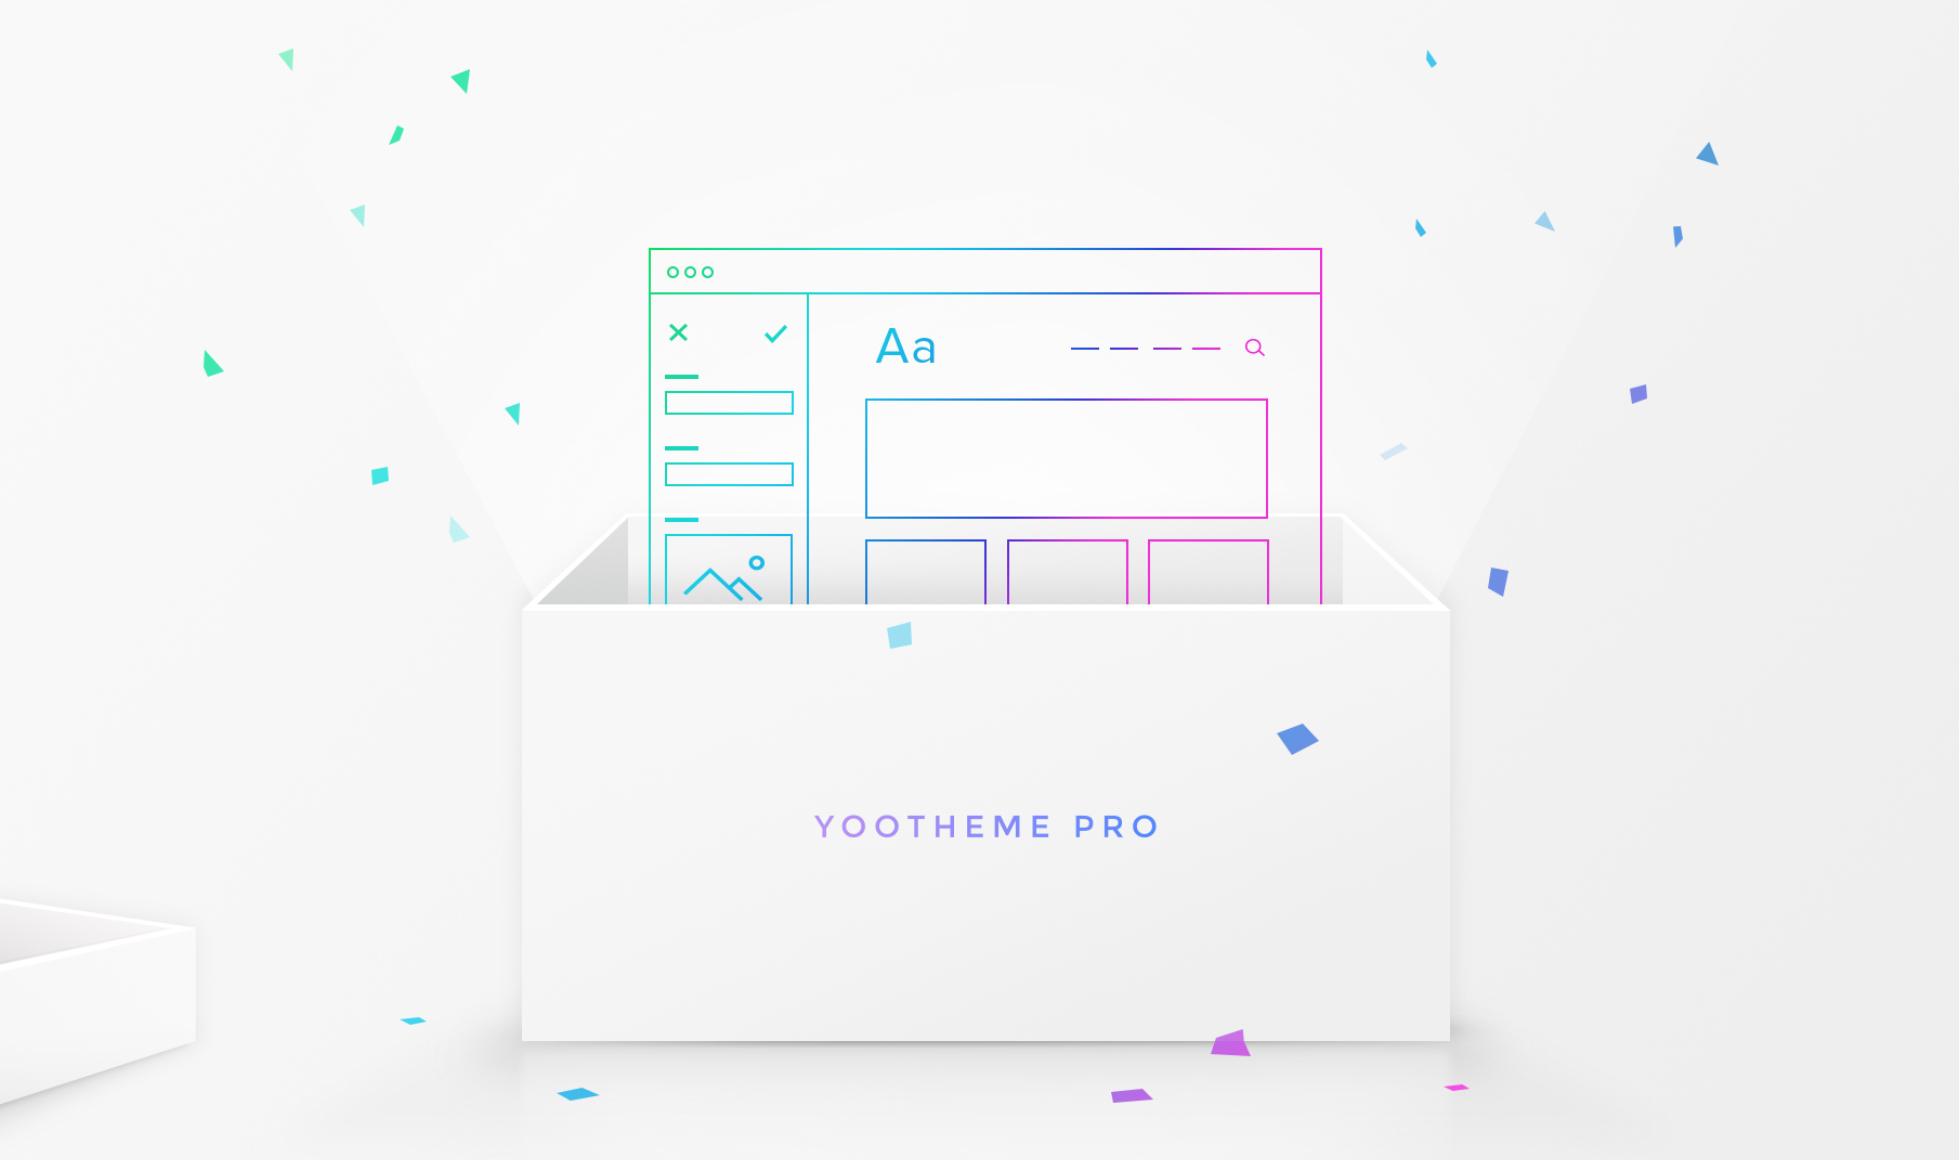 YOOtheme Pro Website Builder – Create websites in no time